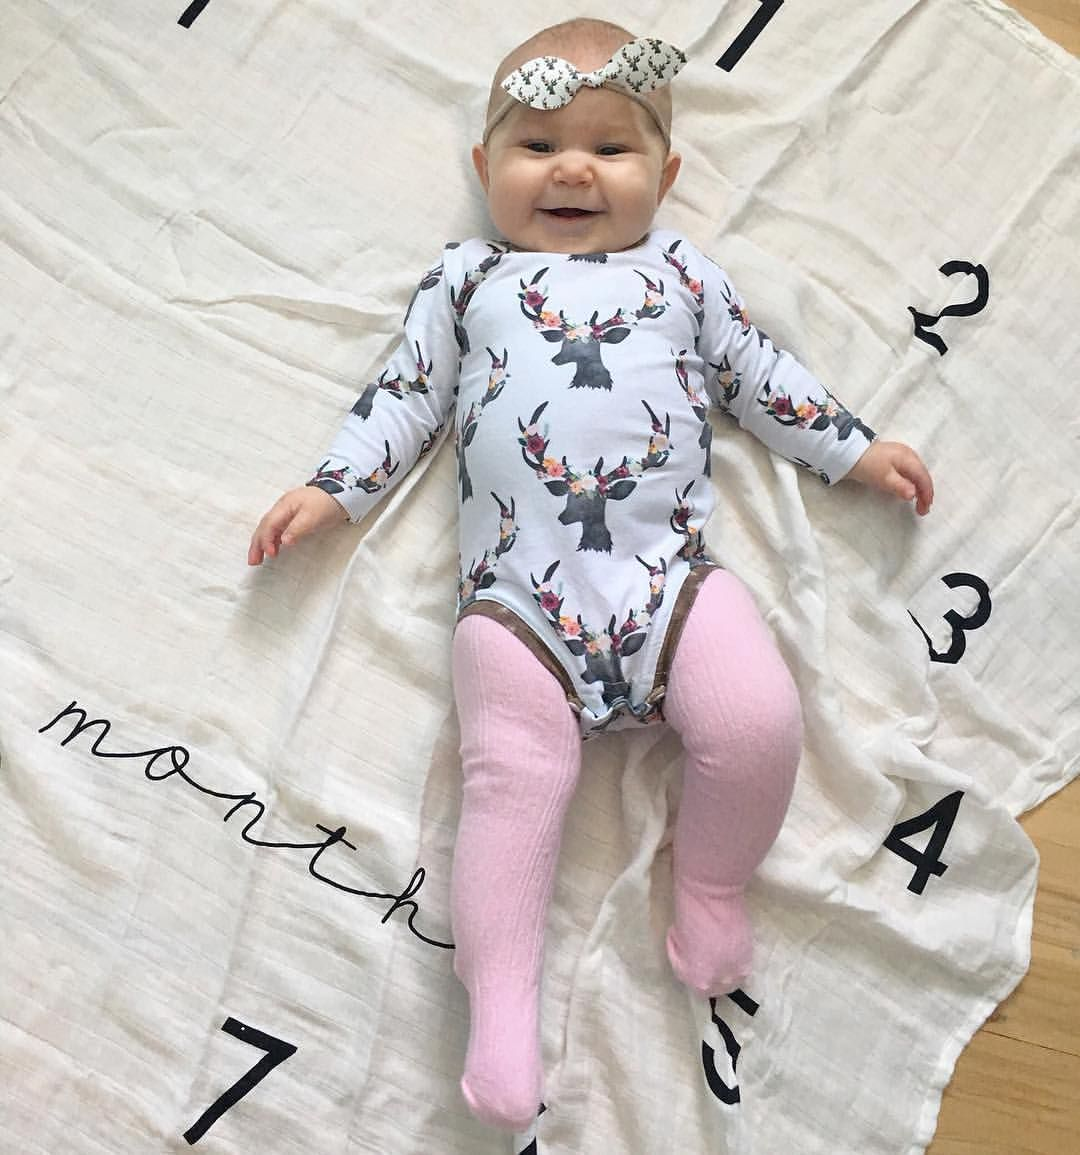 BUNCHA Babies Organic Muslin Cotton Swaddle Blankets 3 Pack Newborn Infant,